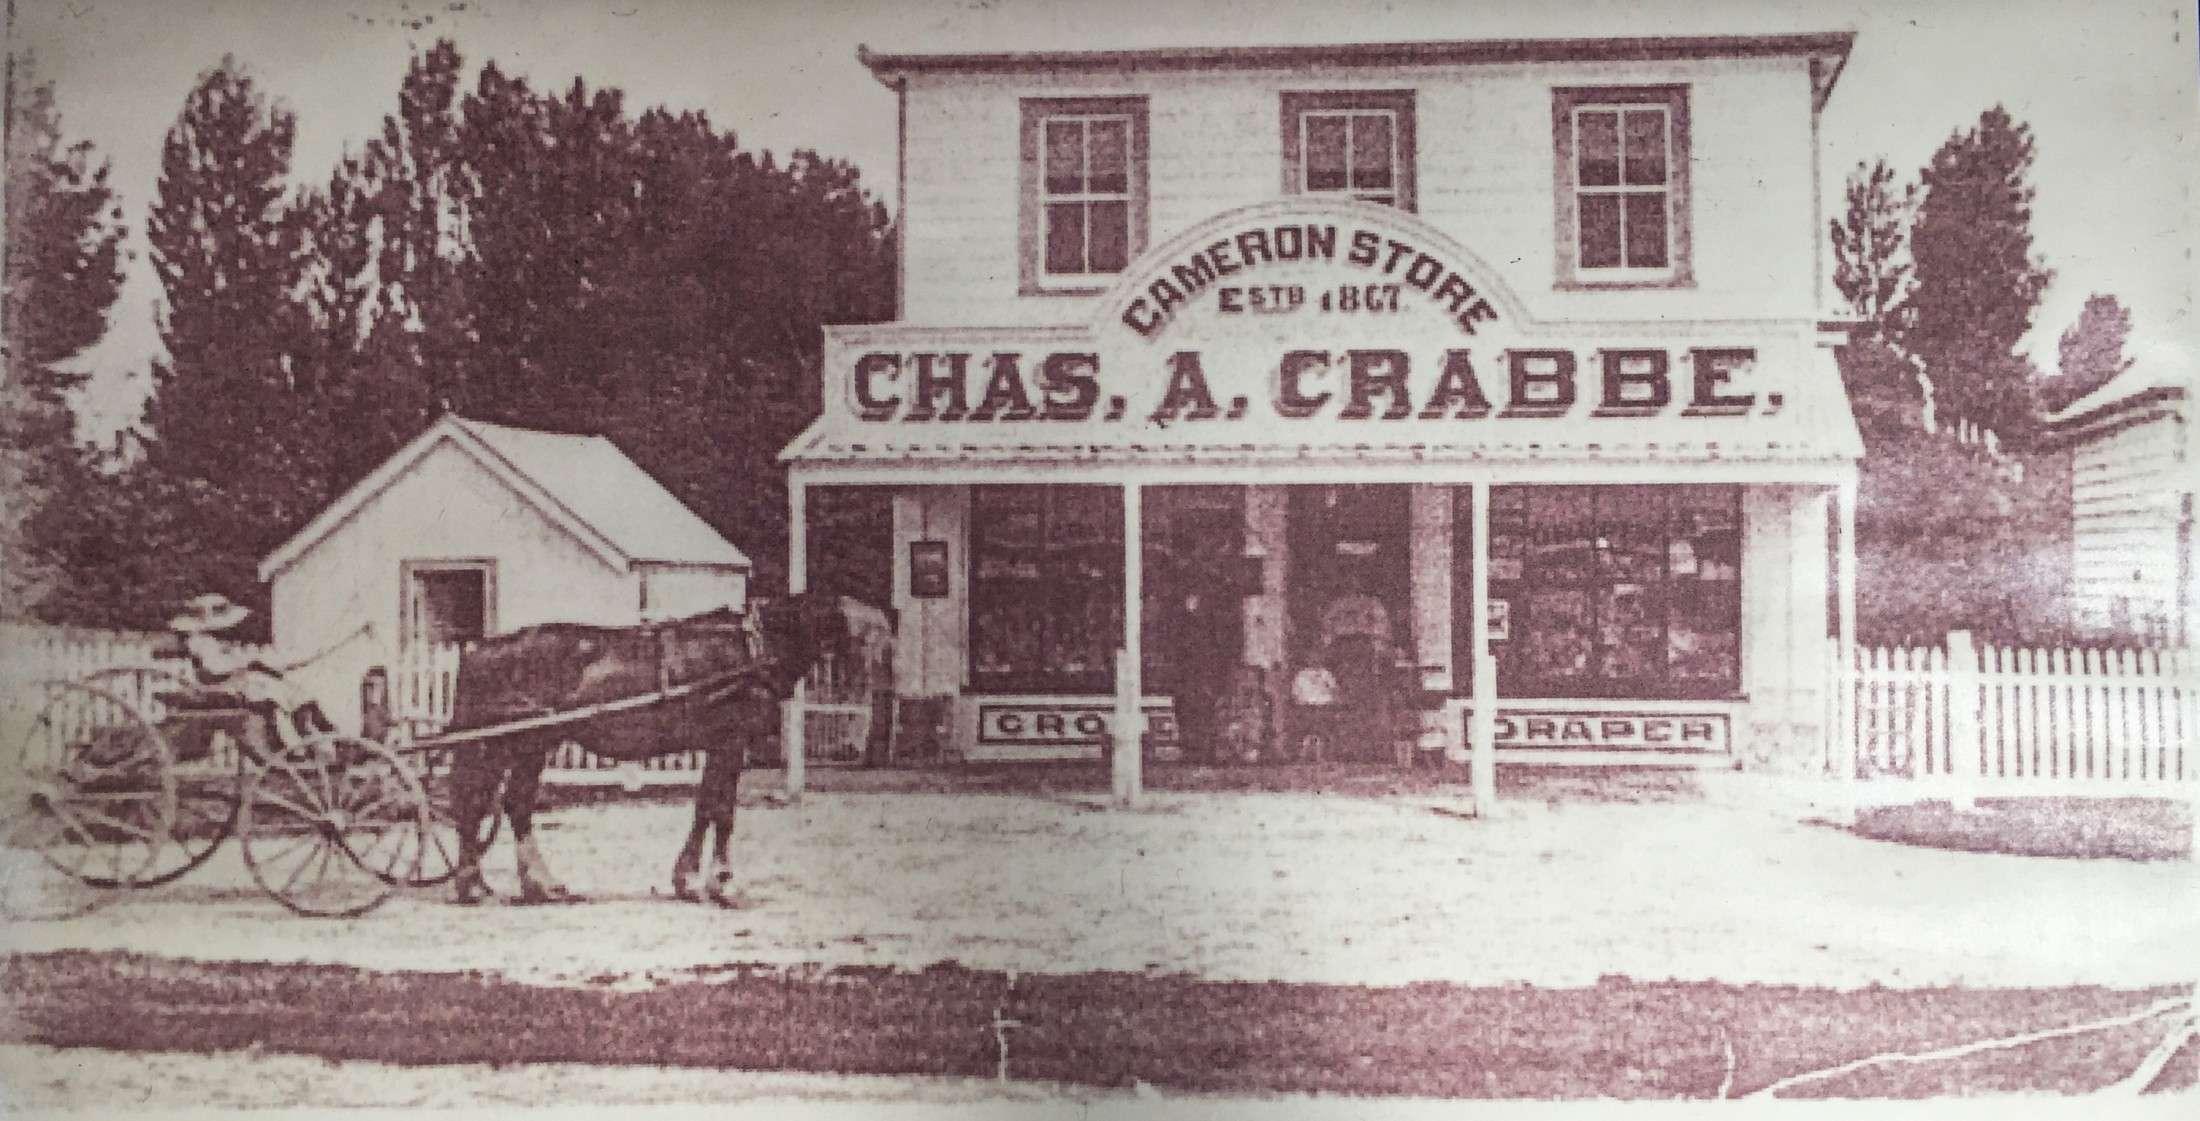 Cameron Store Chas A Crabbe